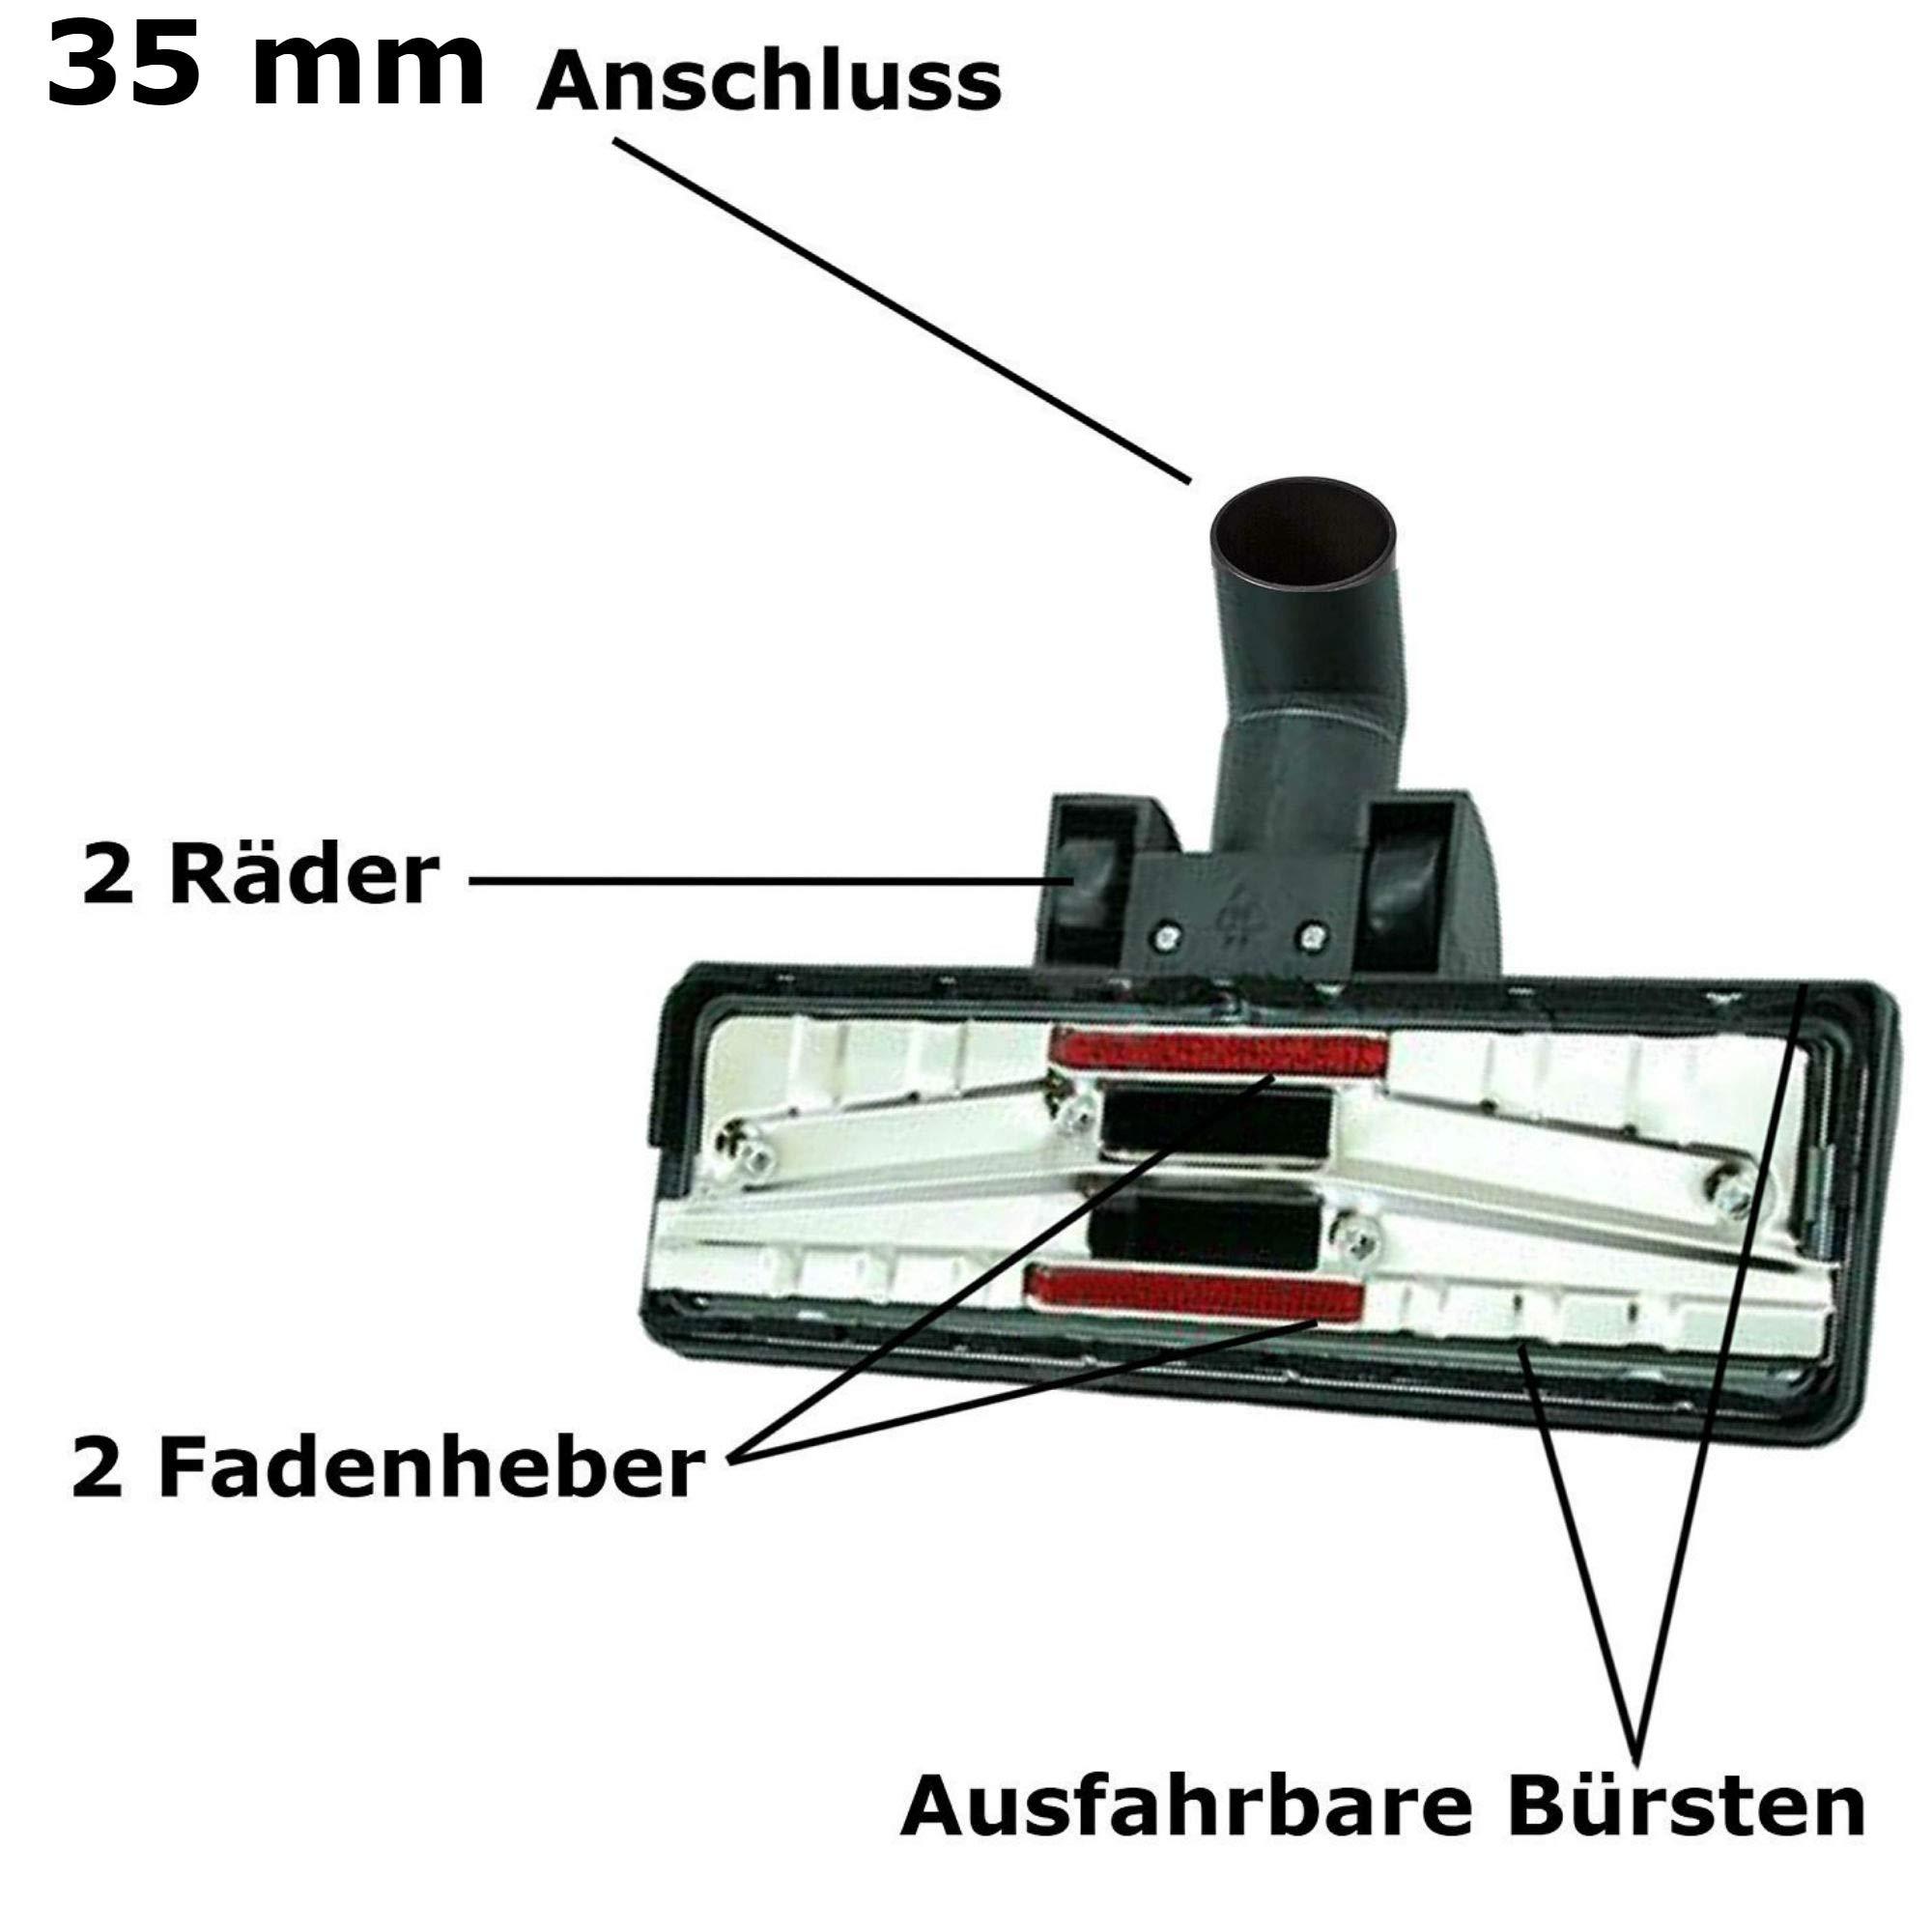 Maxorado - Boquilla para aspiradora de 35 mm, 2 boquillas para Bosch Siemens AEG Quigg Kärcher Fakir EIO Samsung Panasonic Clatronic Einhell Dirt Devil: Amazon.es: Hogar